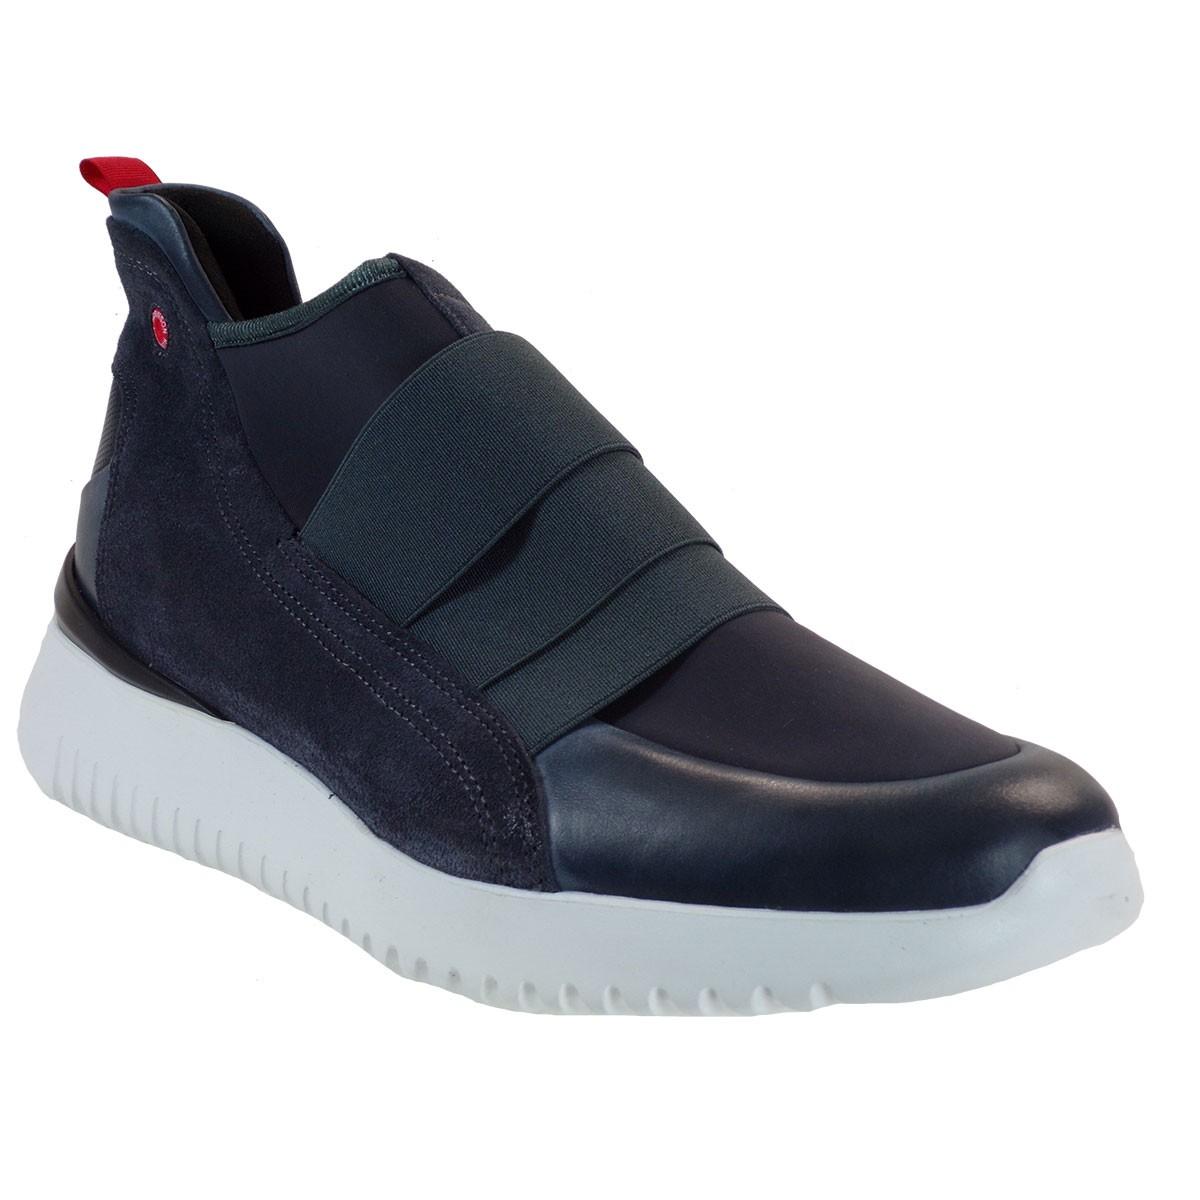 Robinson Ανδρικά Παπούτσια Sneakers 2221 Γκρί Δέρμα